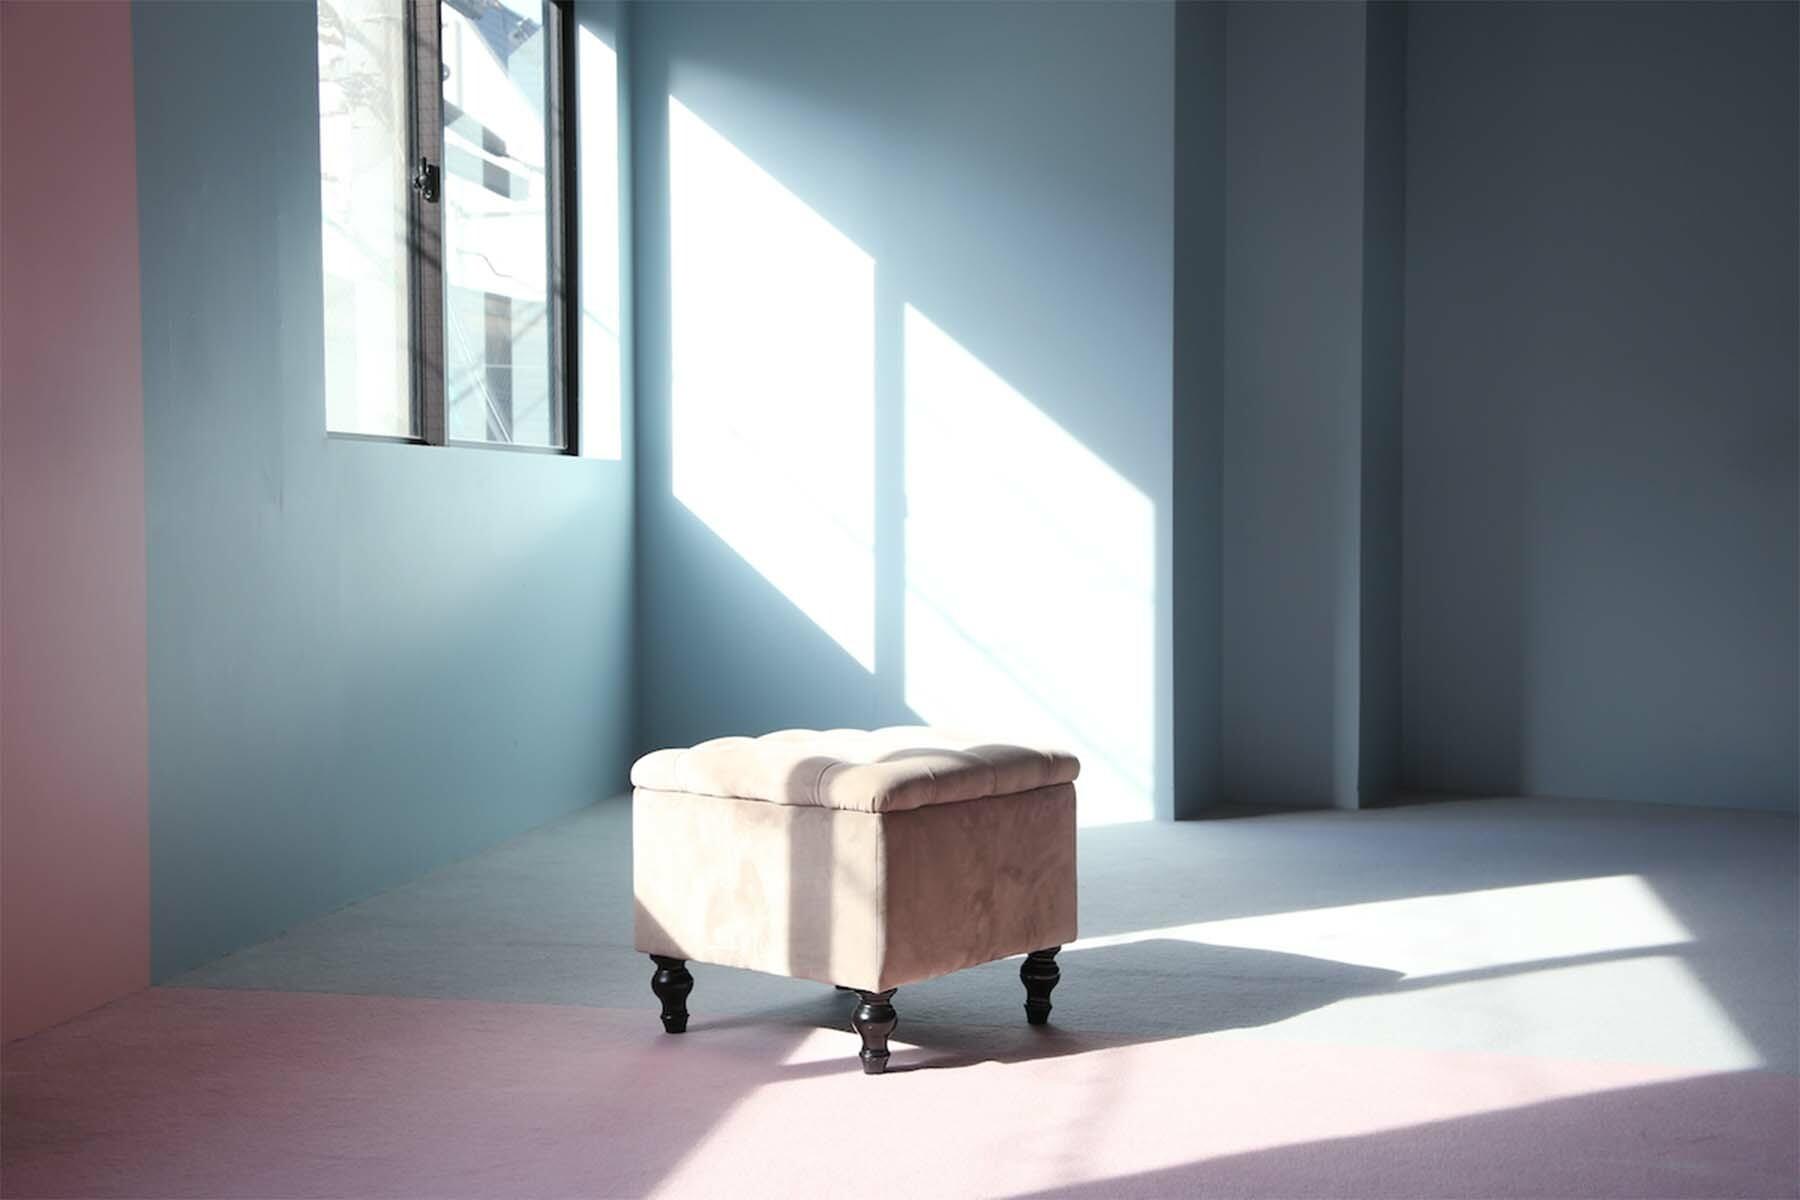 PANSY STUDIO(パンジースタジオ)壁のイラスト